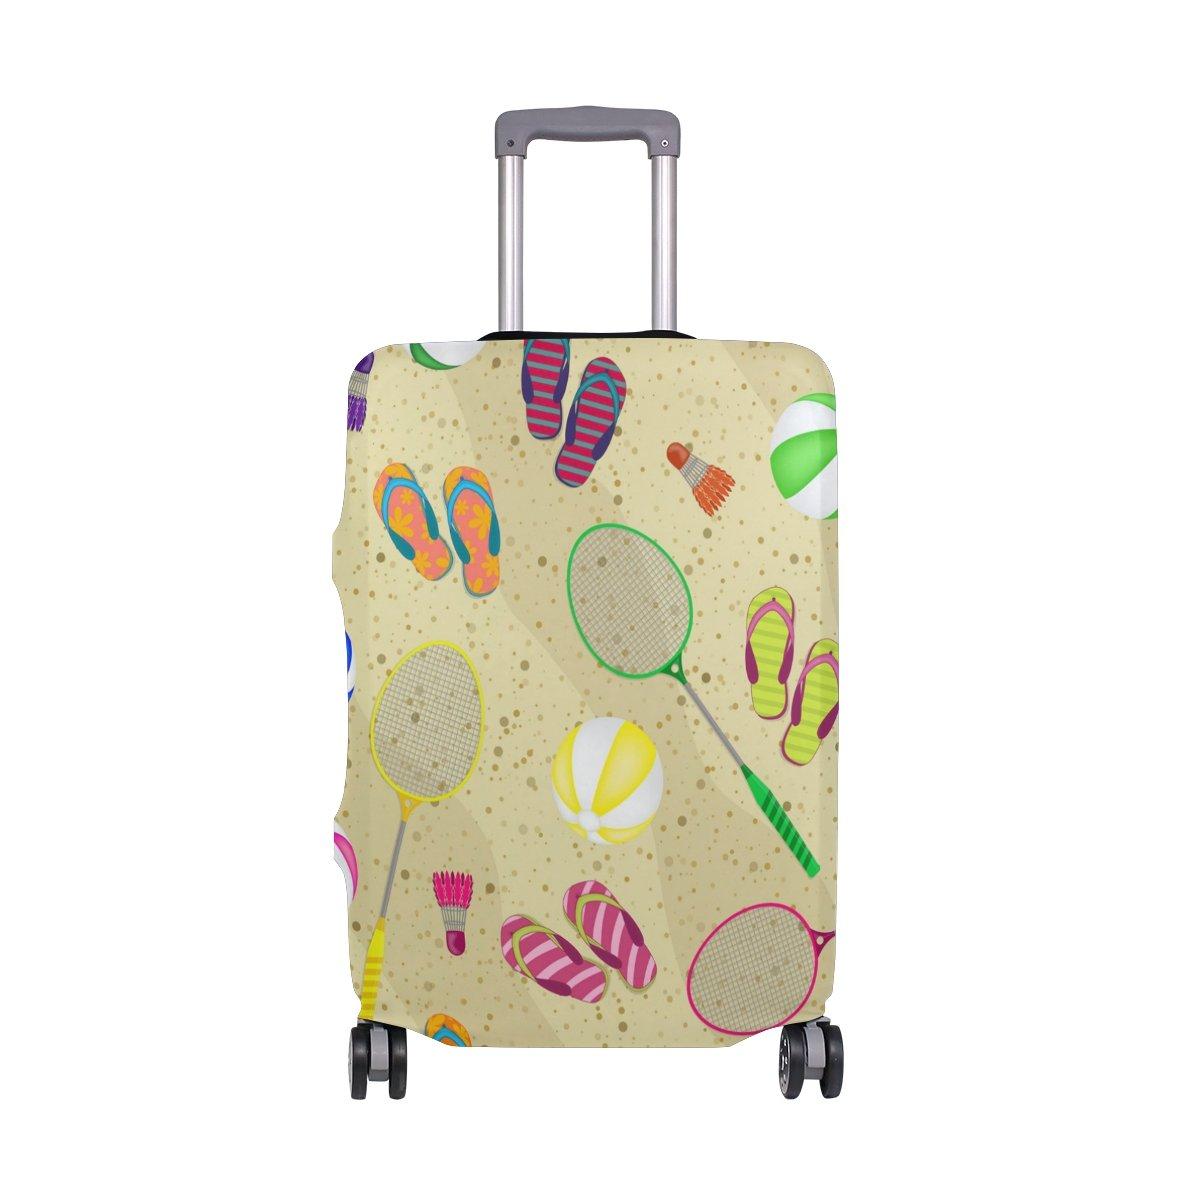 Hello Summer Beach Balls Badminton Suitcase Luggage Cover Protector for Travel Kids Men Women